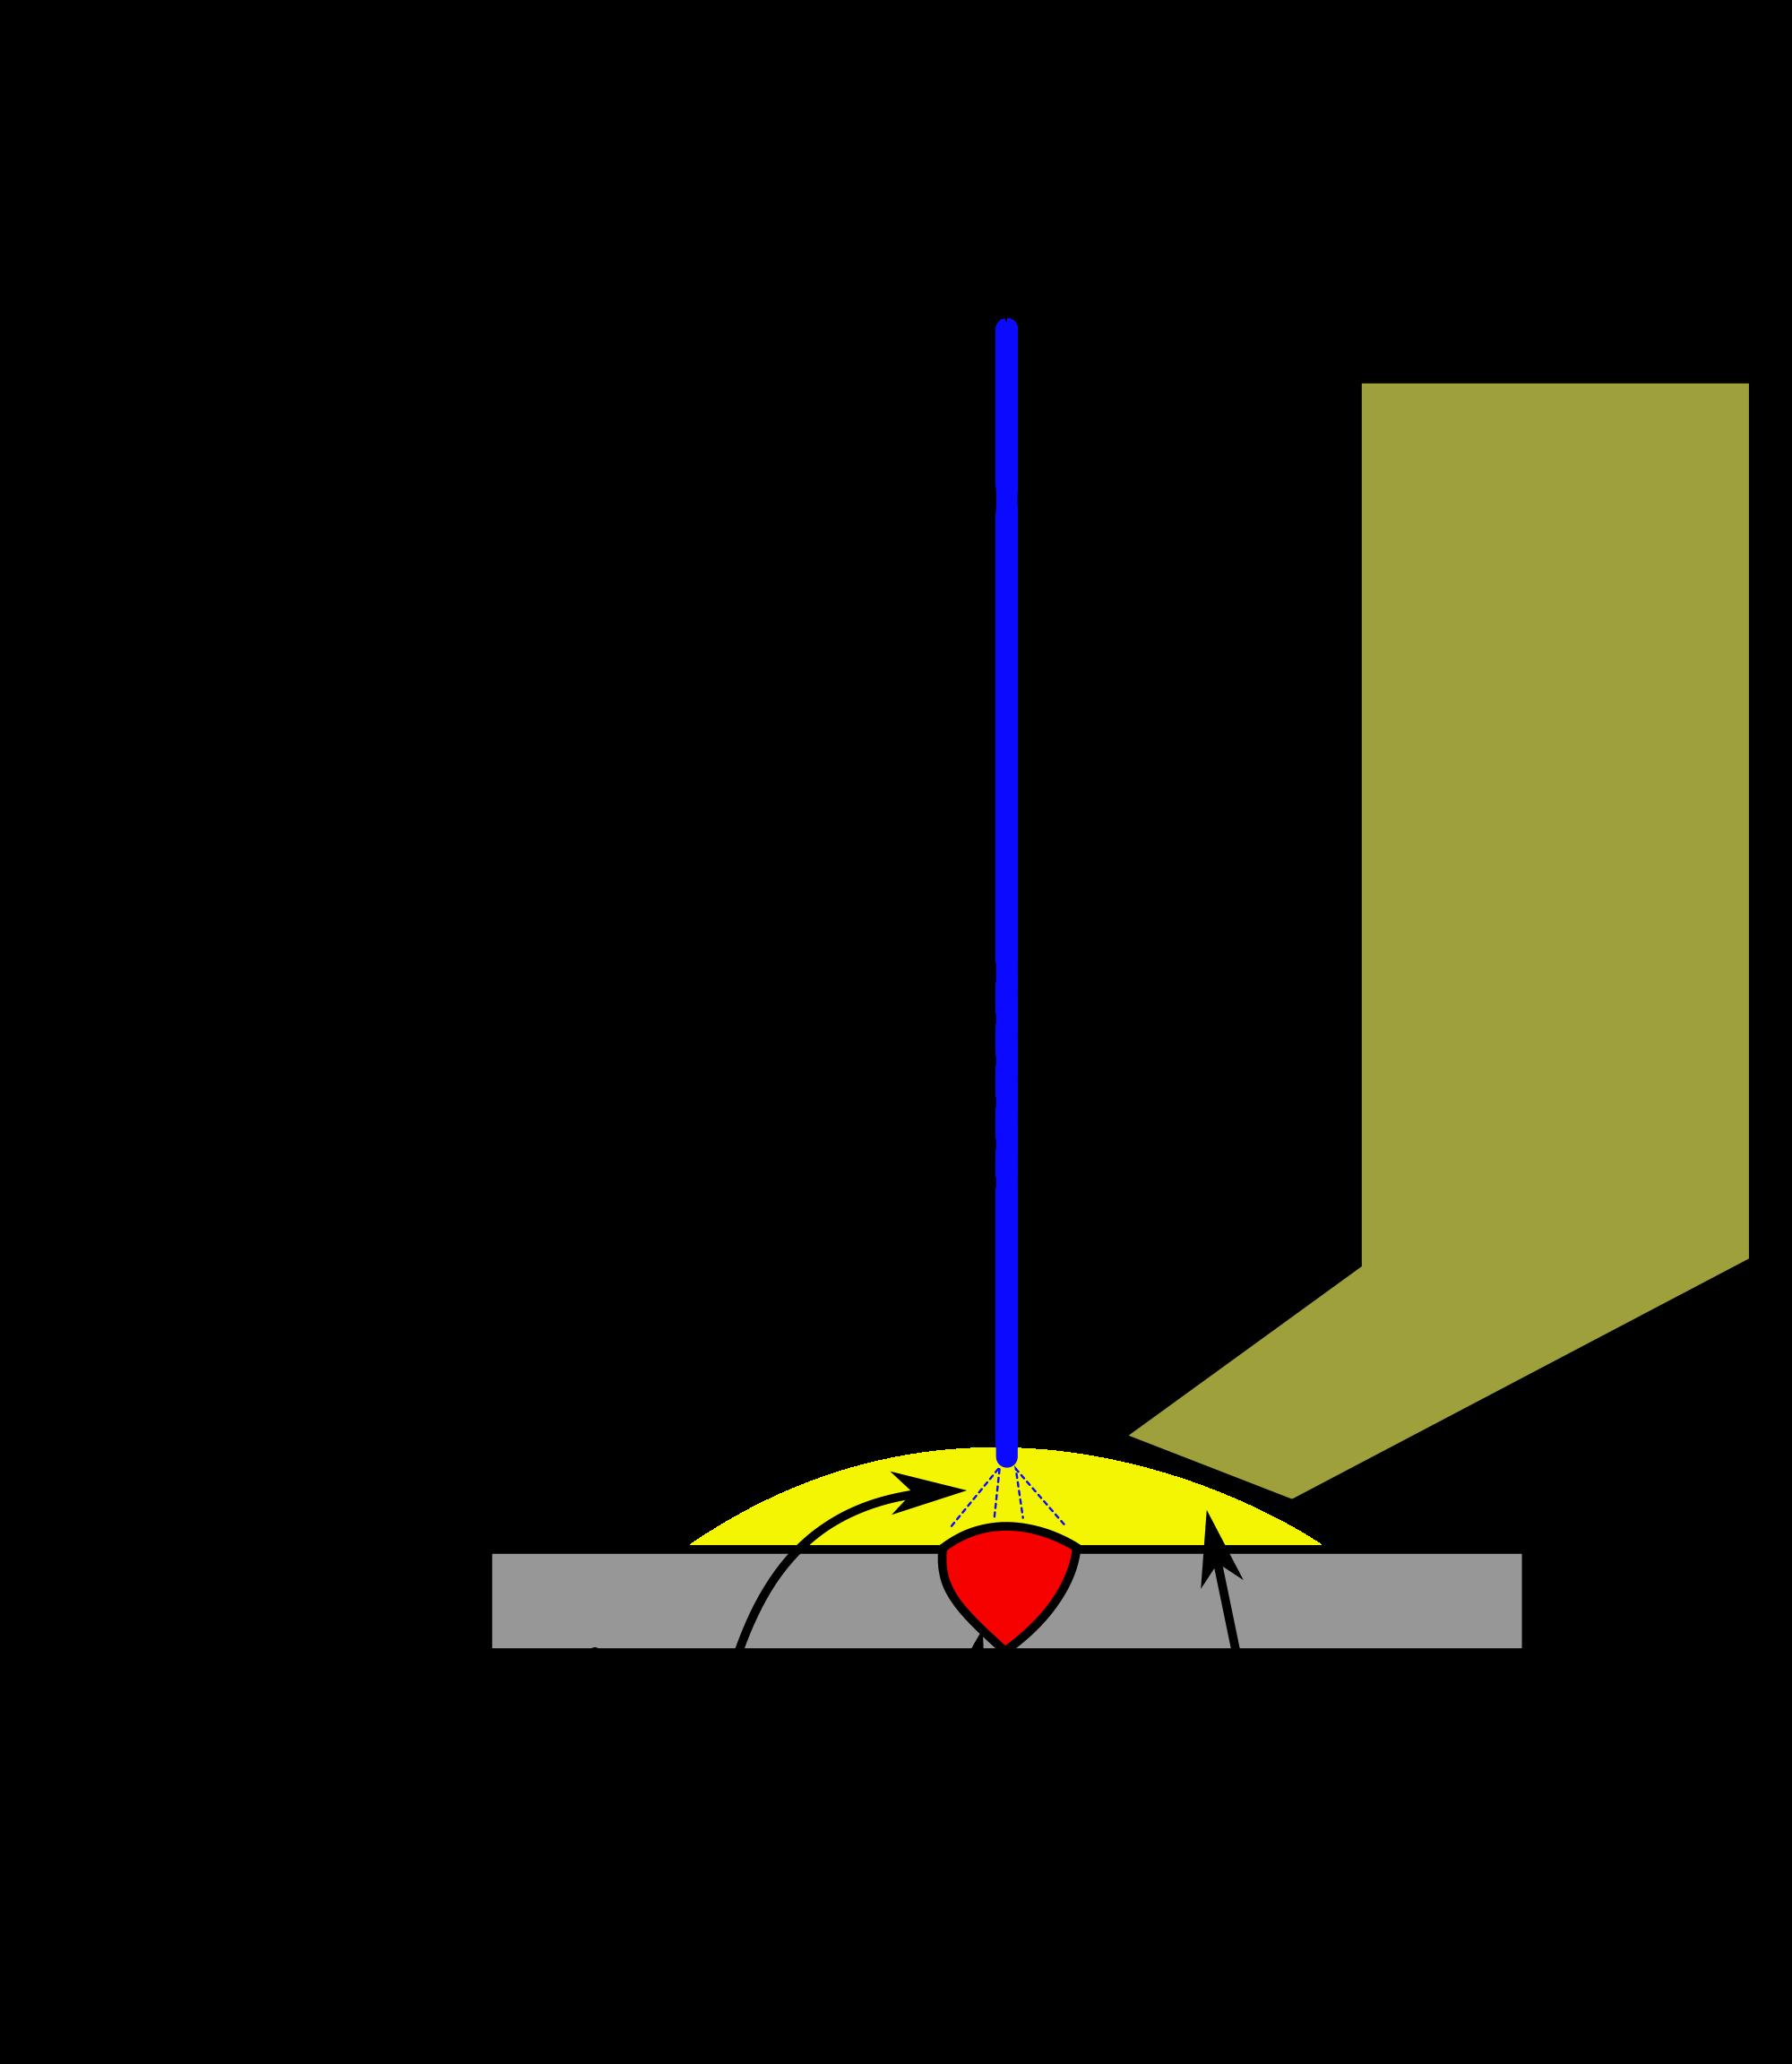 arc welder diagram - Google Search